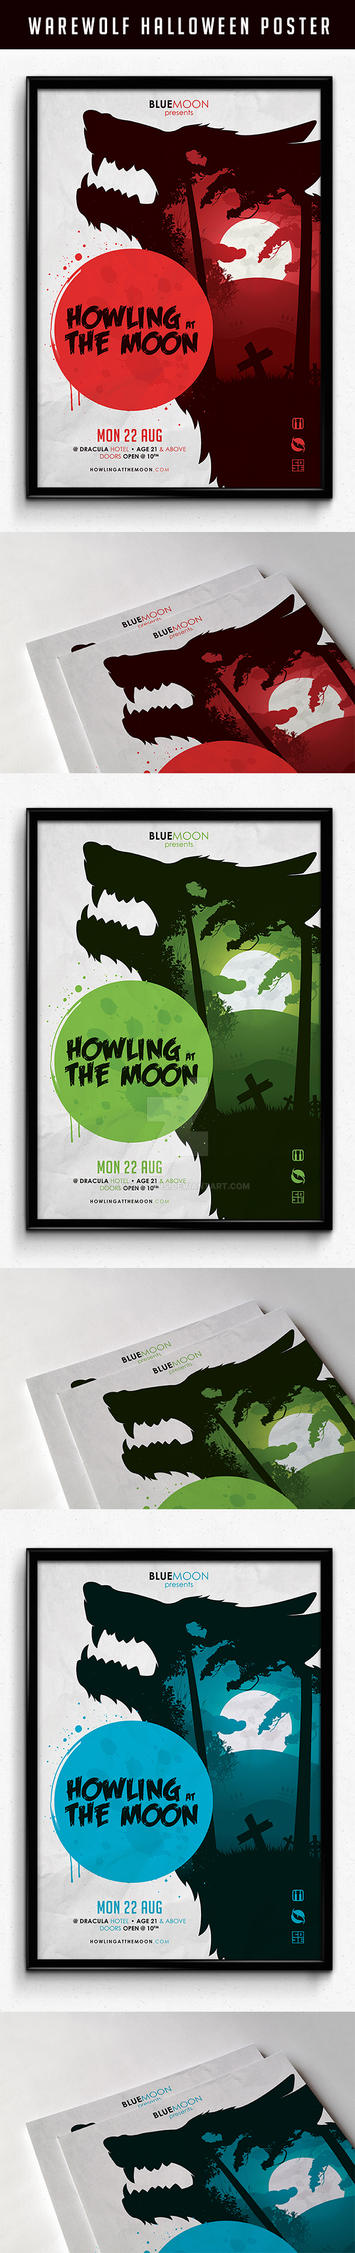 Warewolf Halloween Illustration Poster by snkdesigns